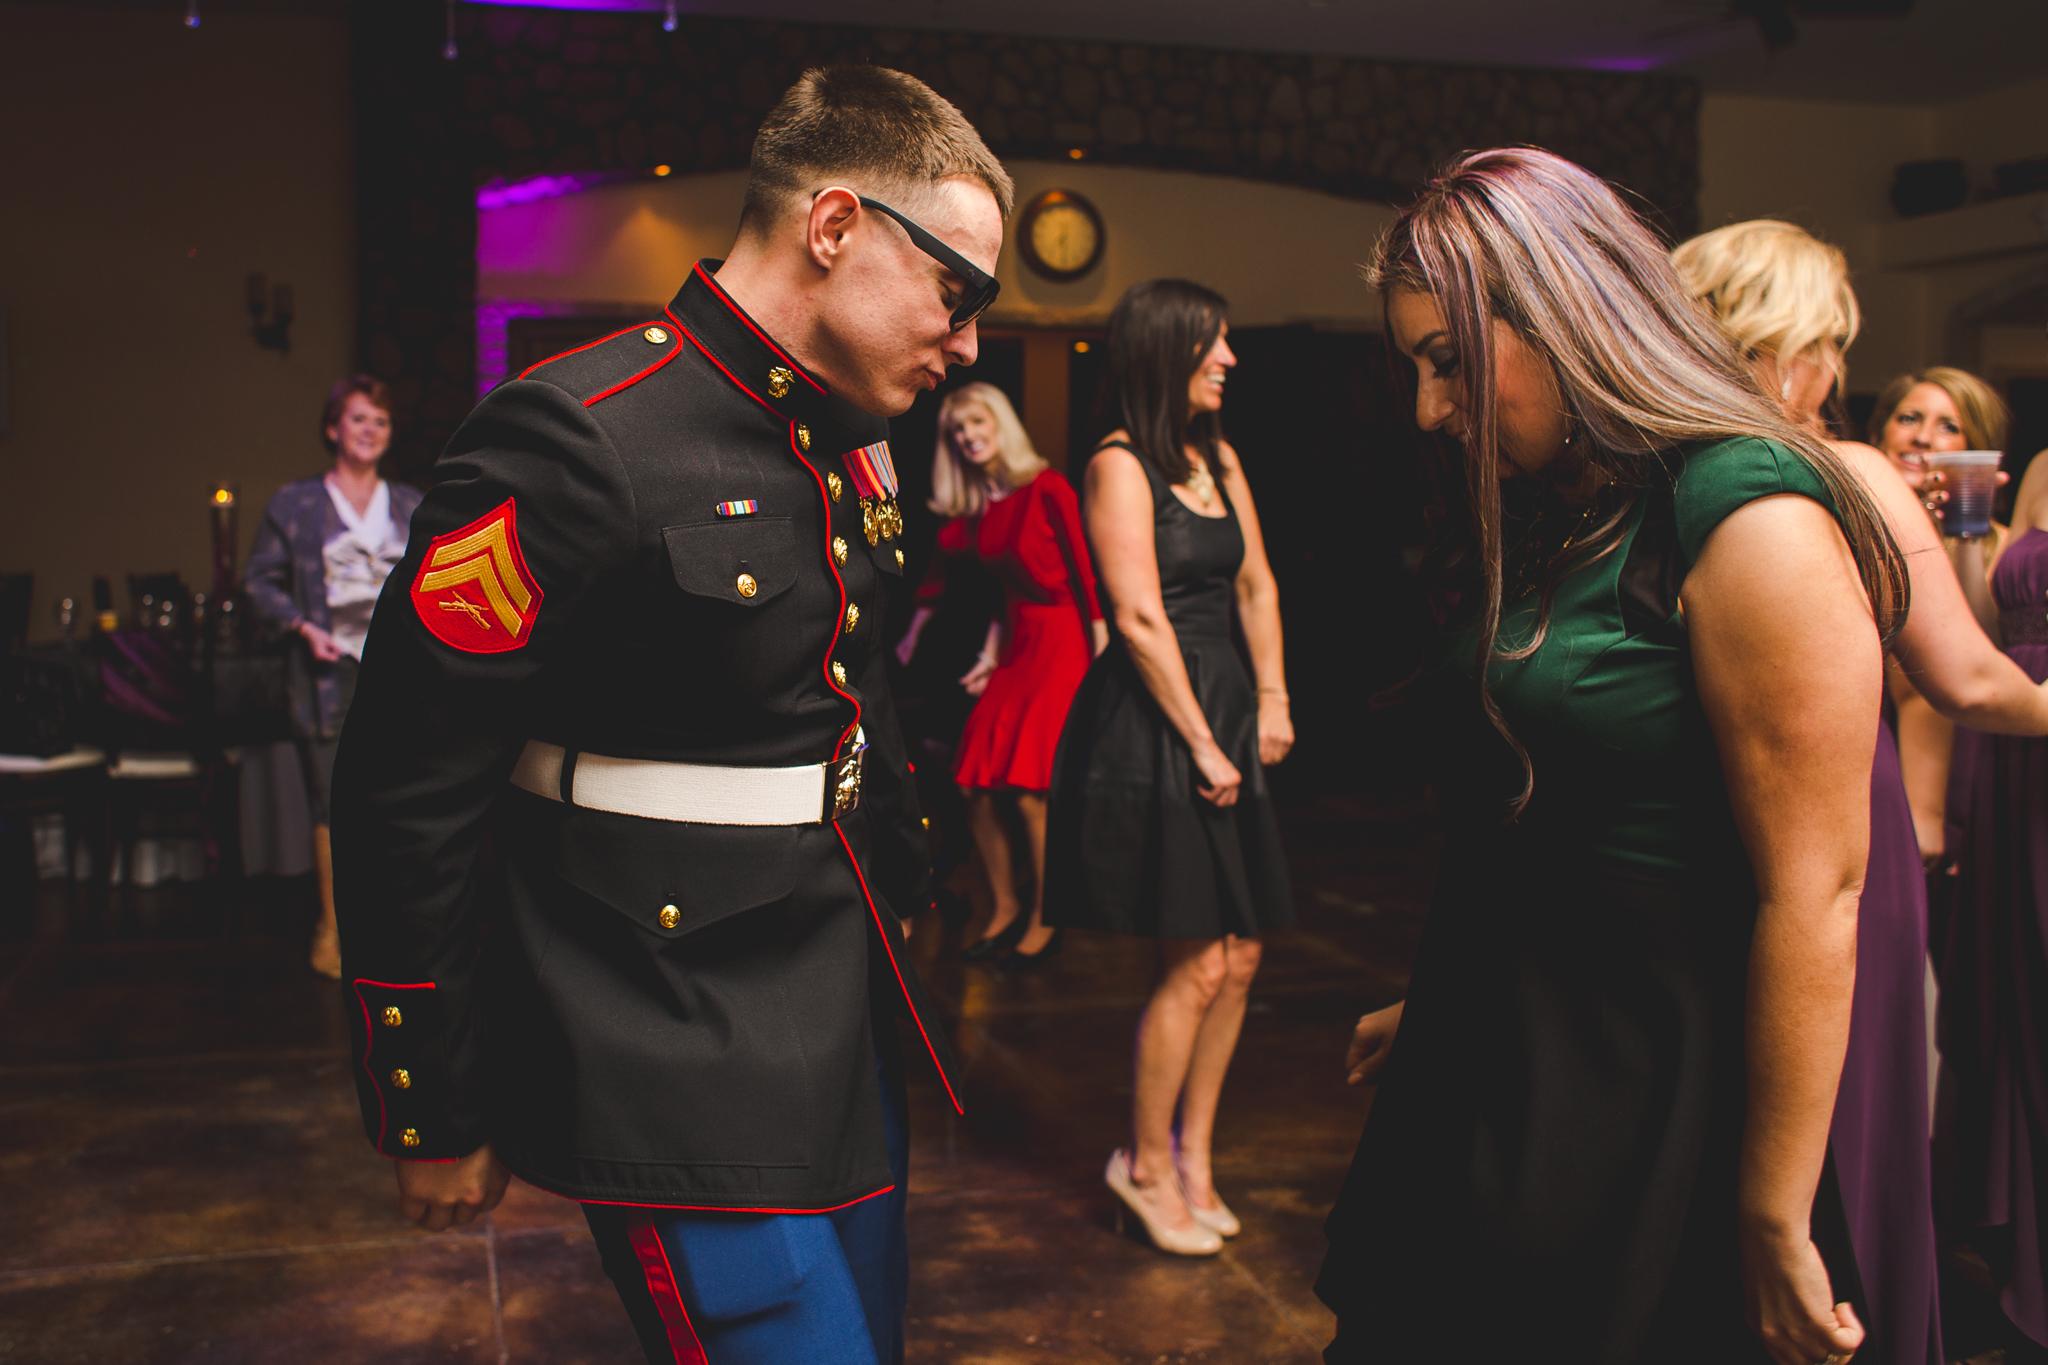 brother dances on floor at wedding mj